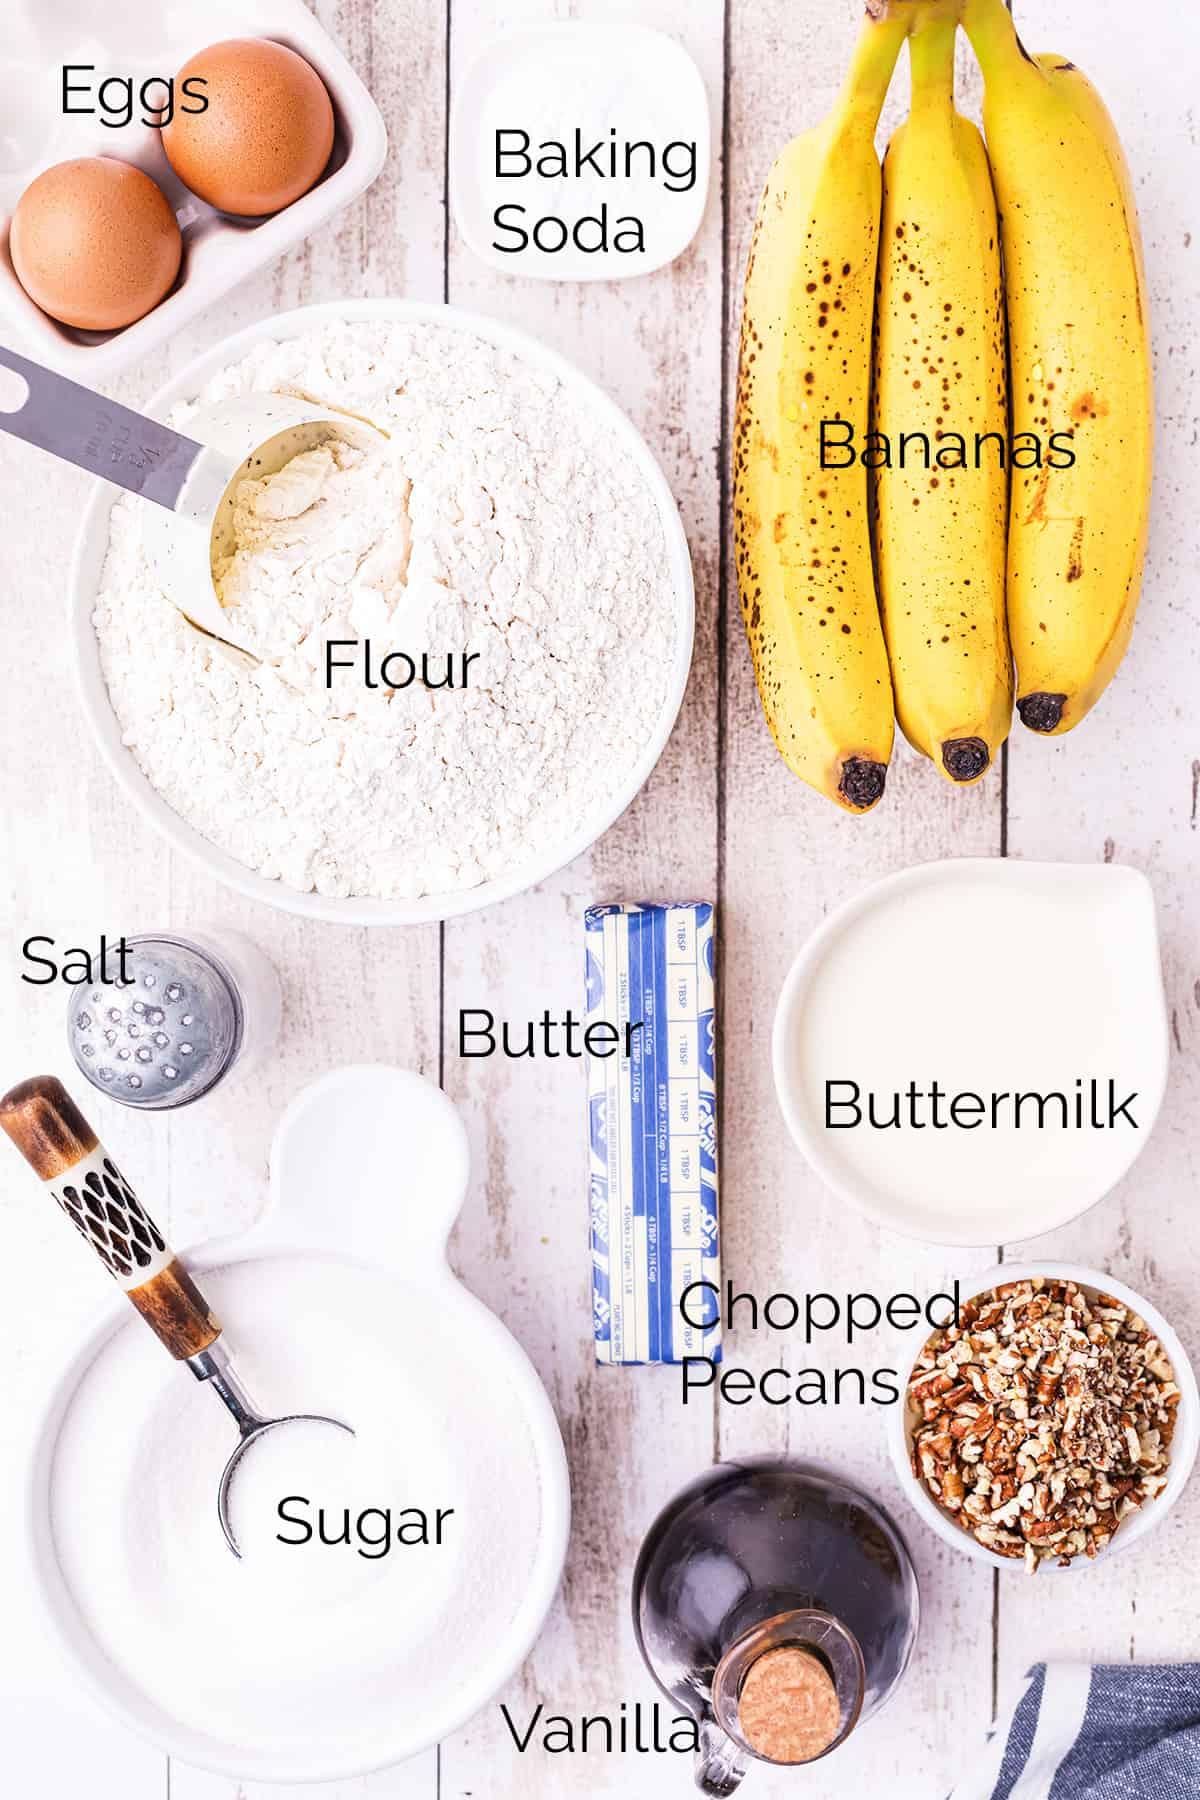 Ingredients needed for Buttermilk Banana Nut Bread: sugar, butter, eggs, flour, baking soda, buttermilk, bananas, pecans, salt, and vanilla extract.